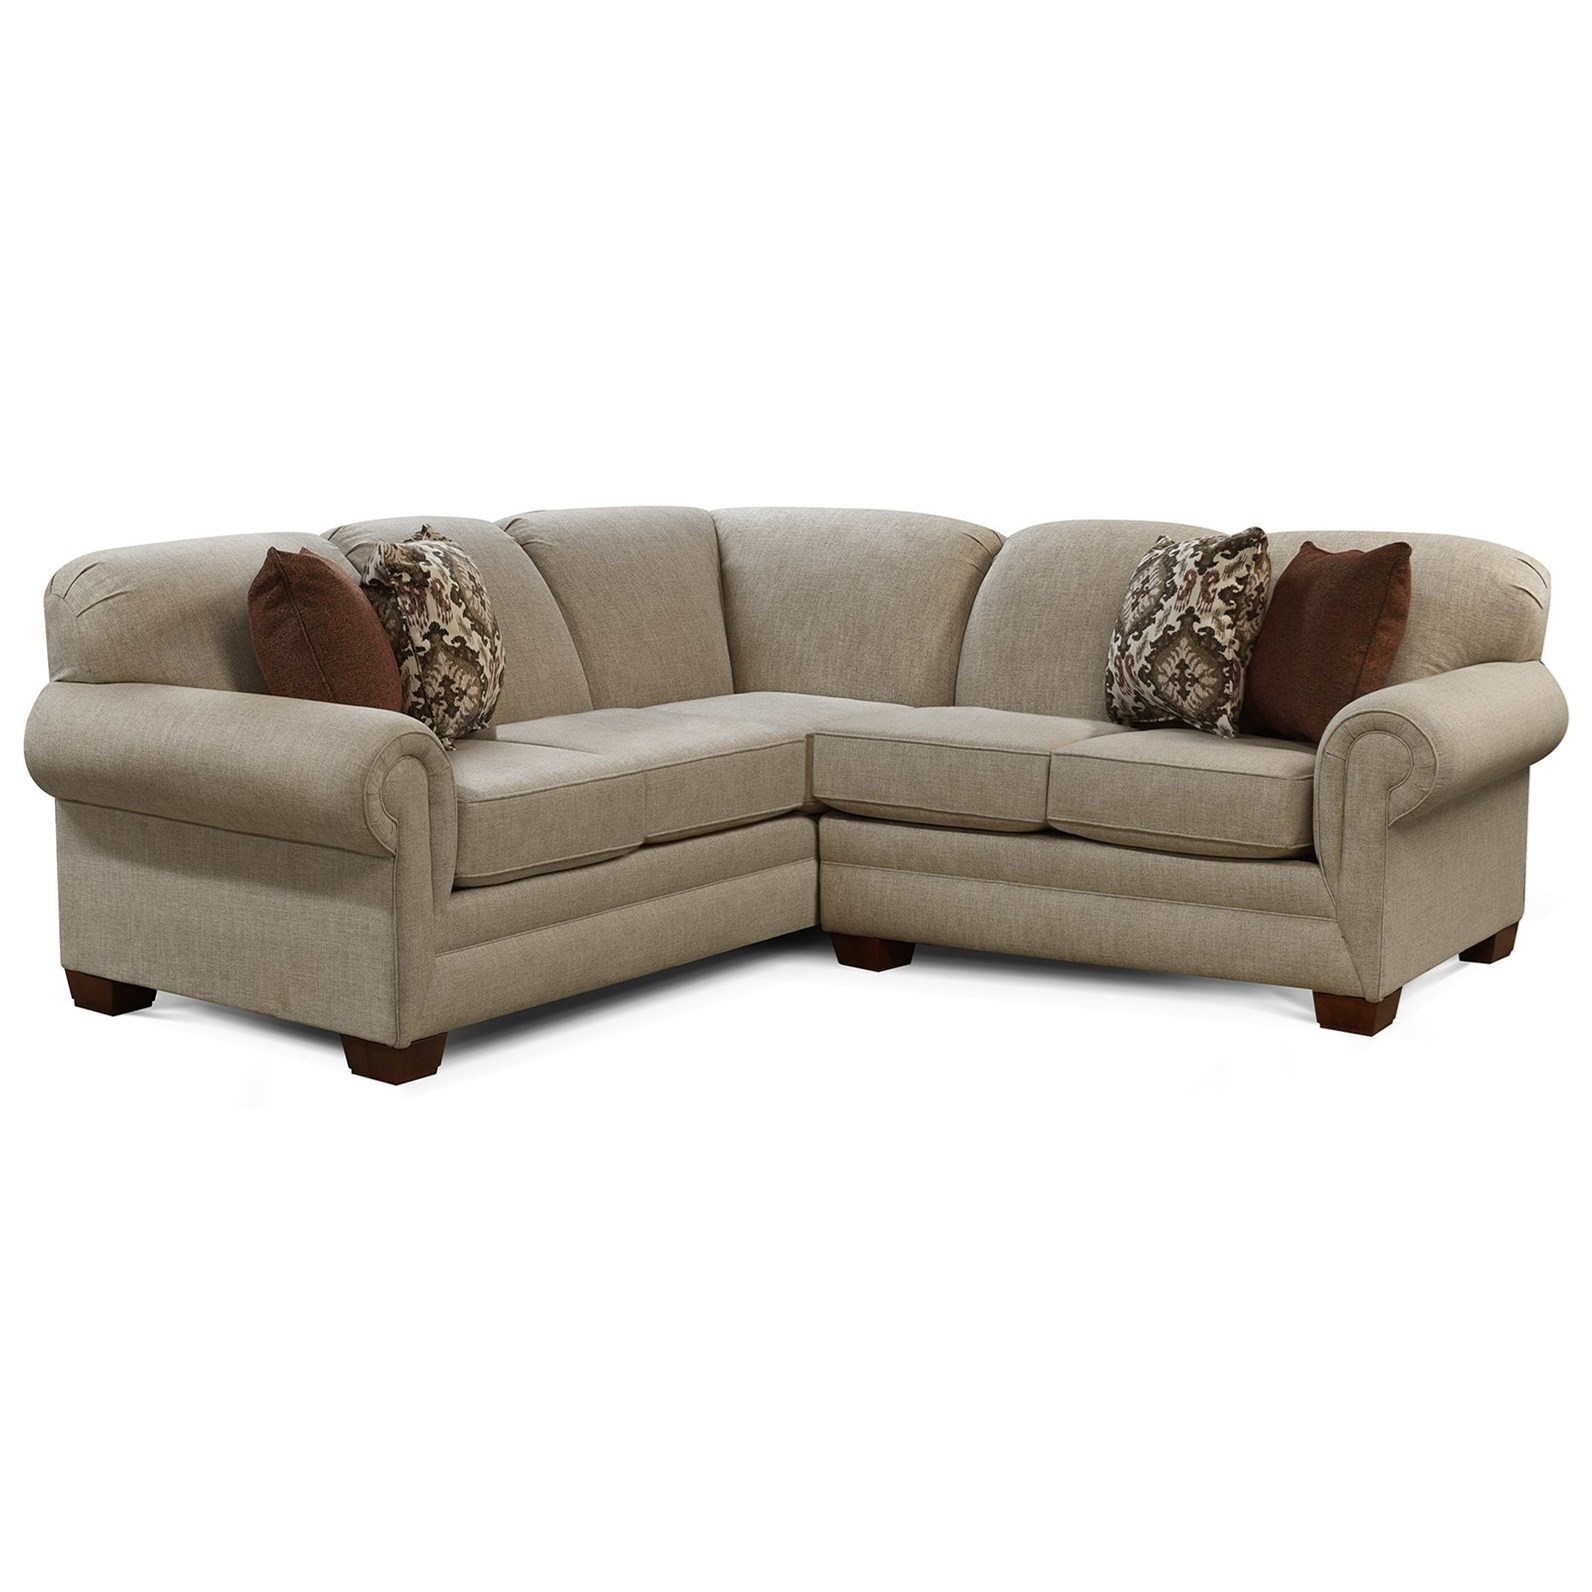 2 Piece Sofa Sectional